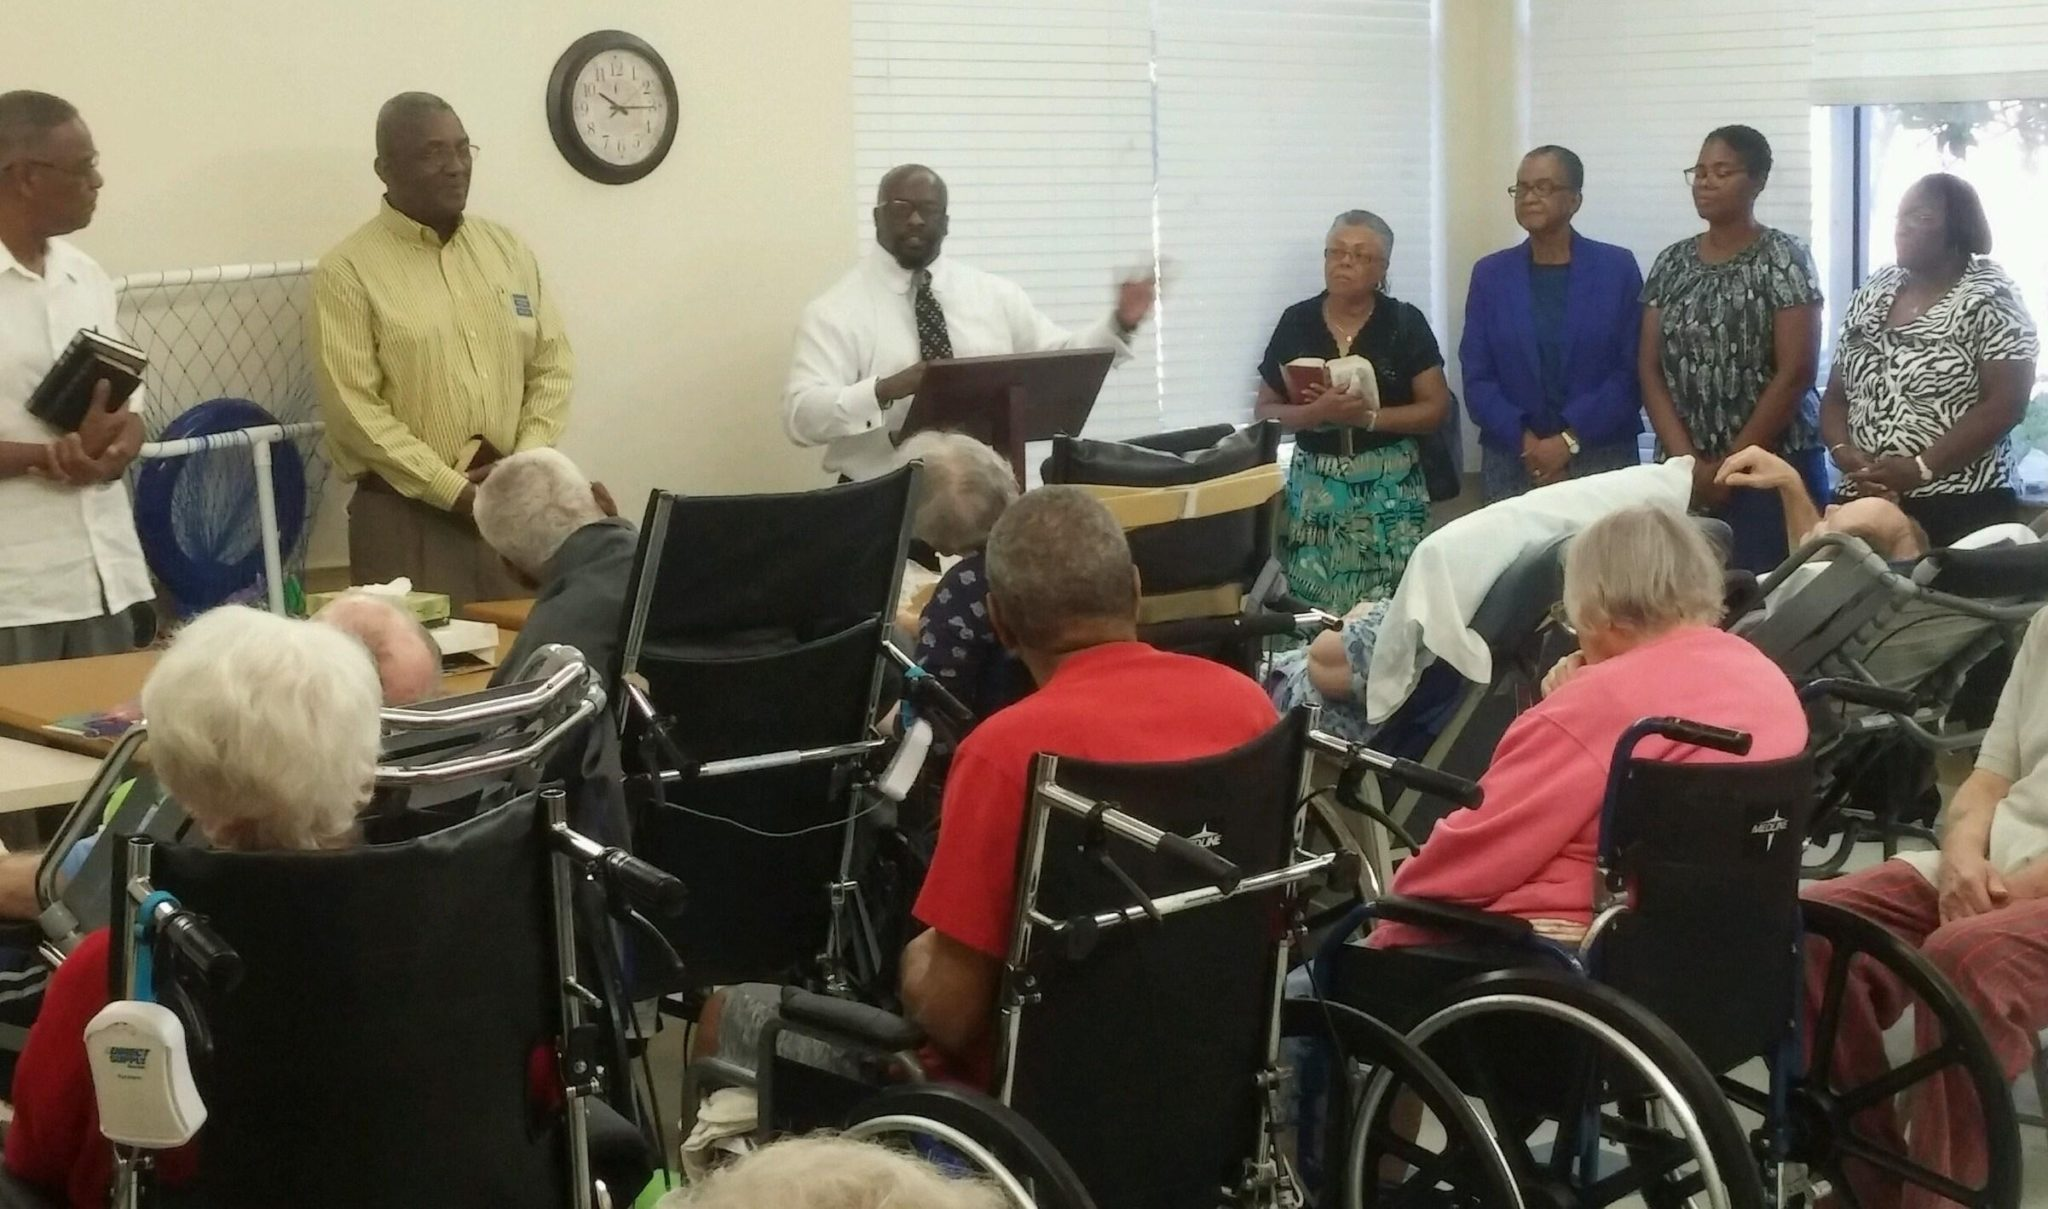 Atlantic Shores Nursing Home  Oct. 15, 2016